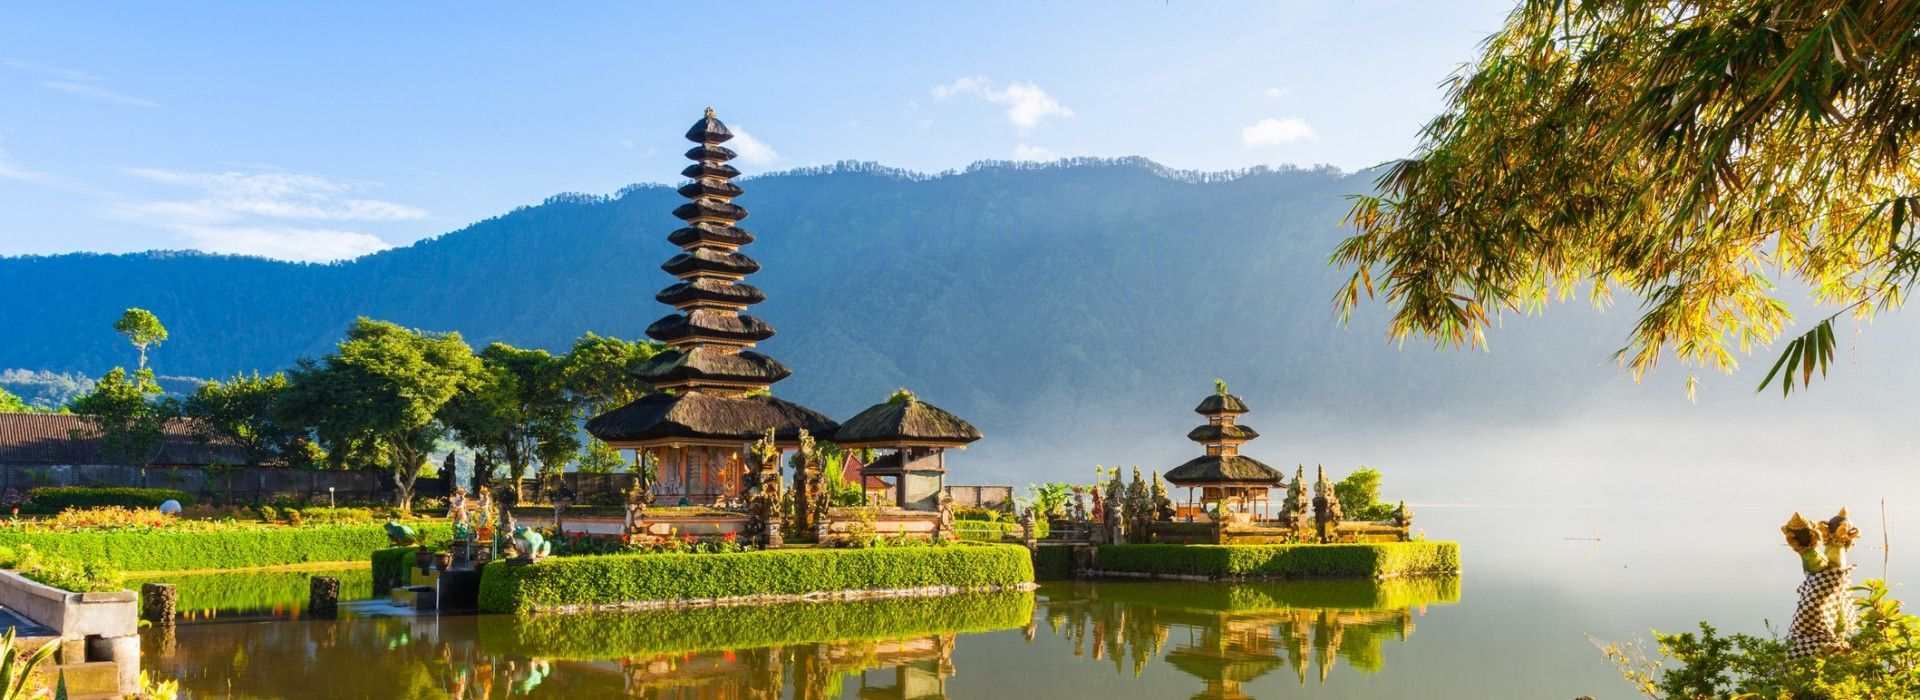 Honeymoon Tours in Indonesia